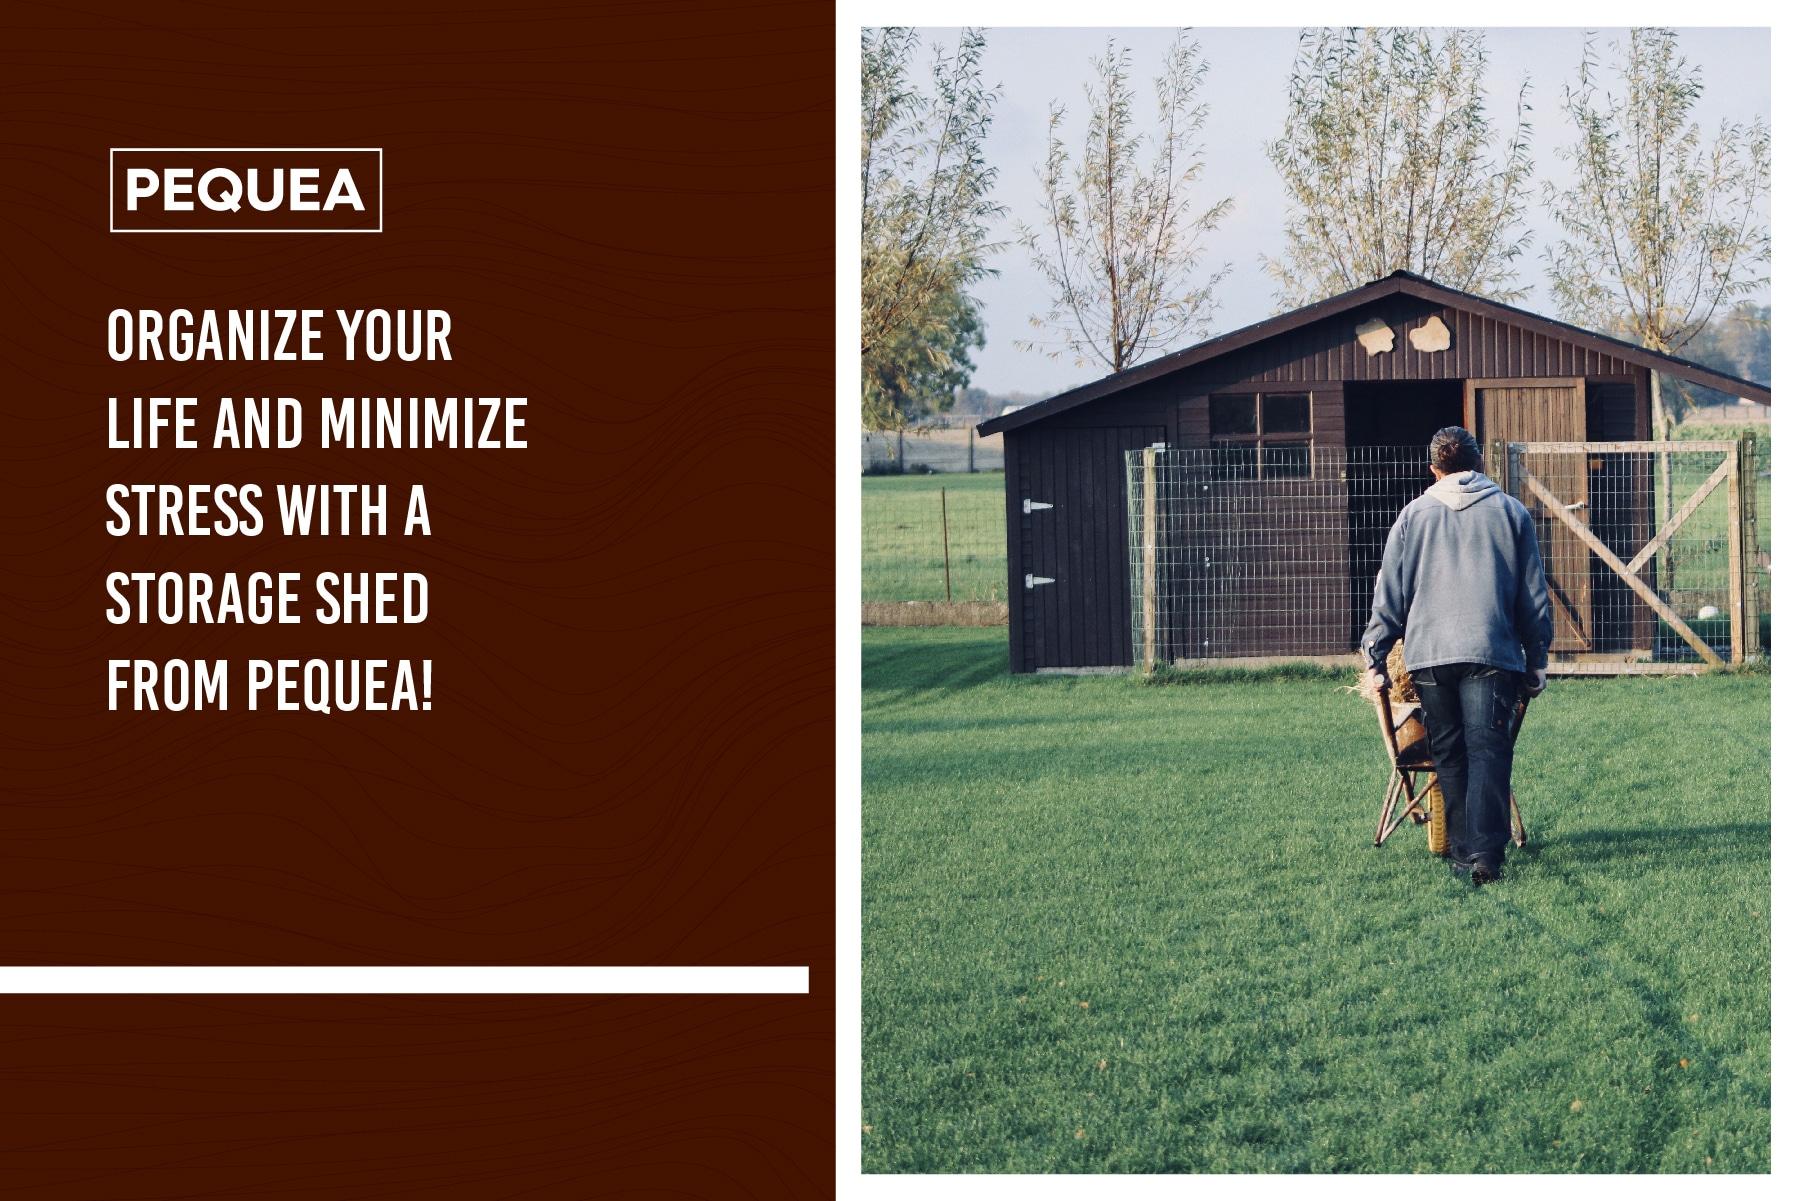 minimize stress with storage shed